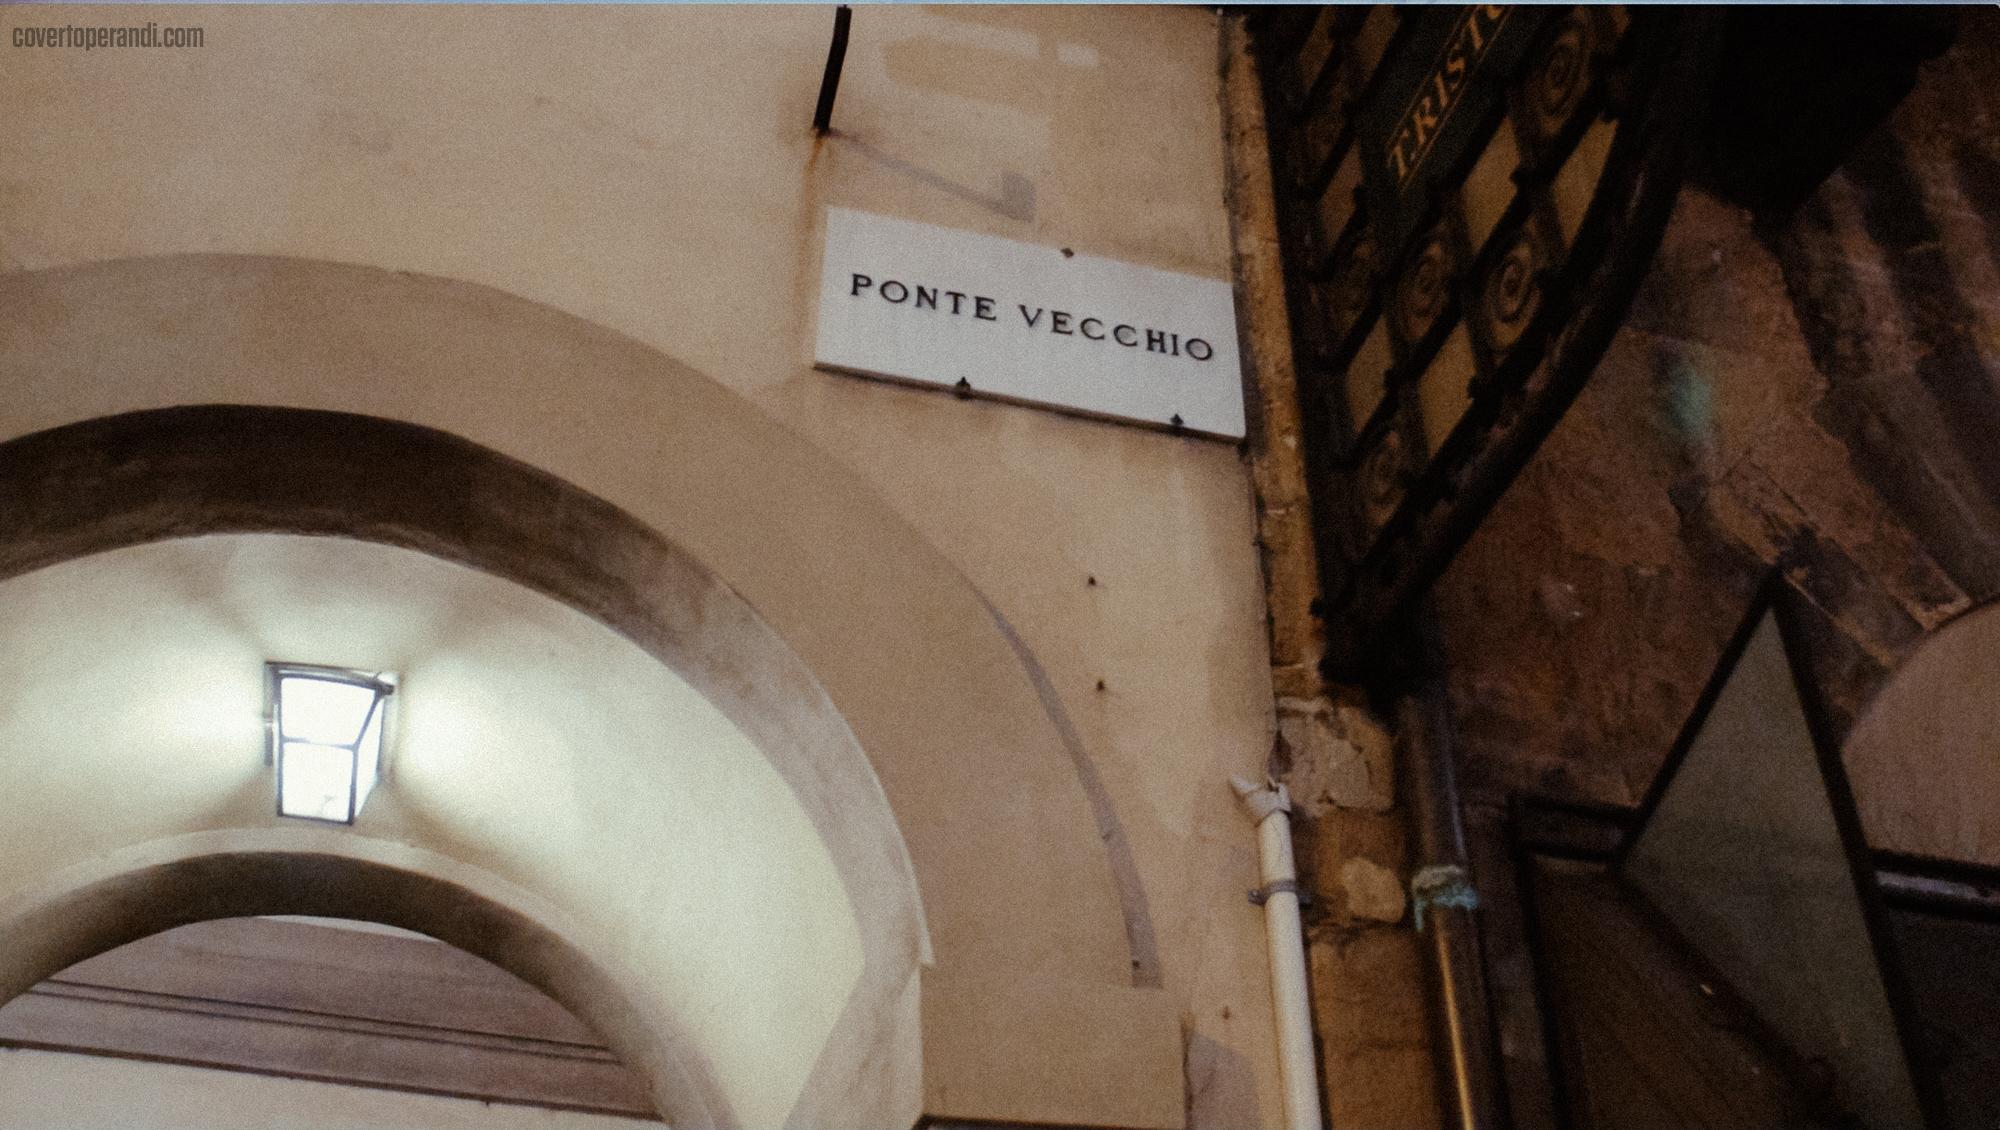 Covert Operandi - 2014 Florence-64.jpg